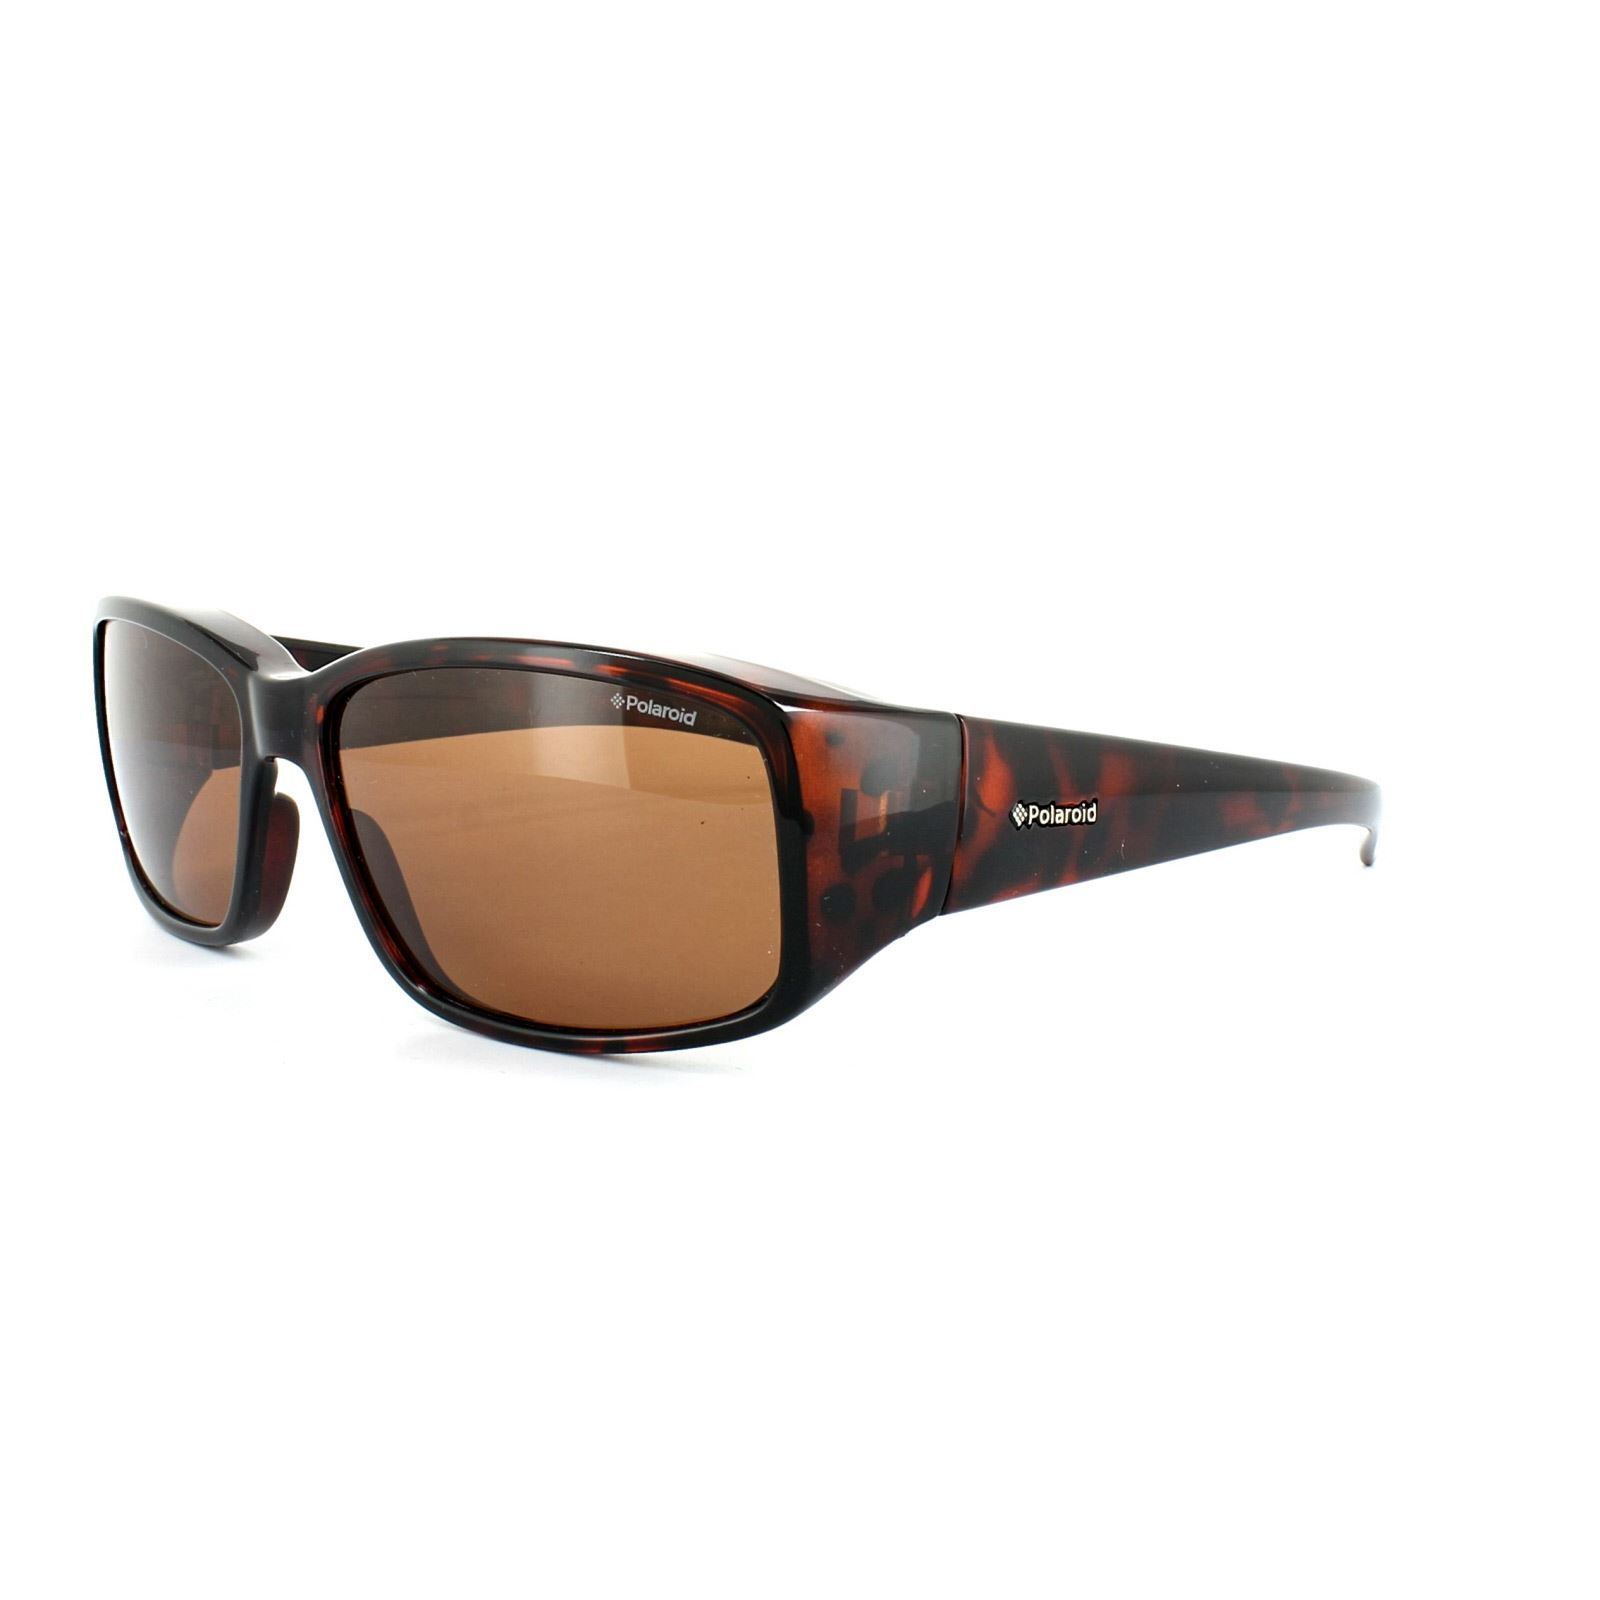 Polaroid Suncovers Fitover Sunglasses P8306 0BM C2 Havana Dark Copper Polarized